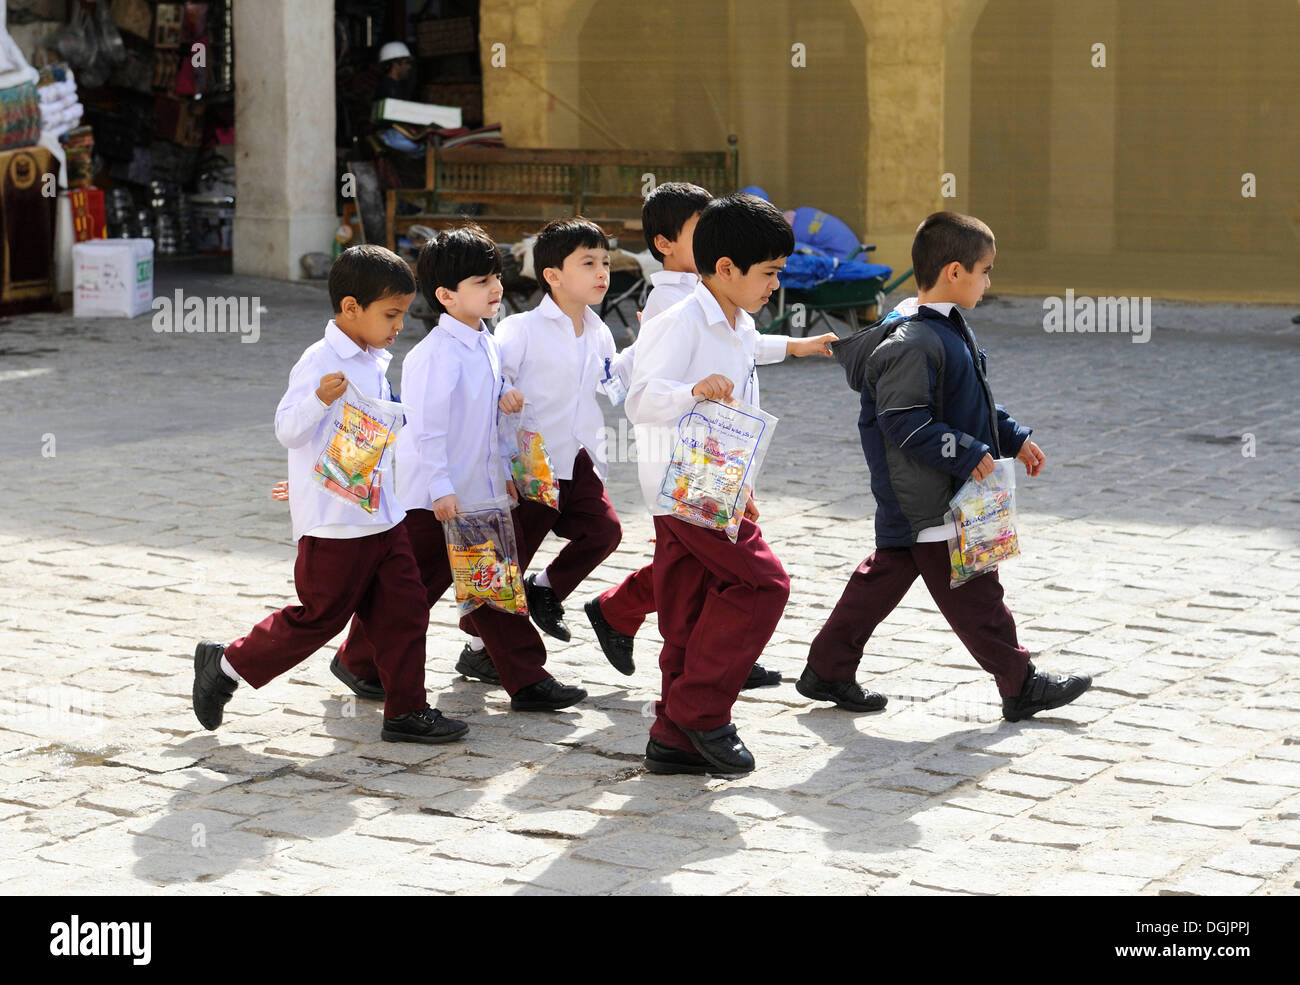 School children wearing school uniforms, Doha, Qatar, Arabian Peninsula, Persian Gulf, Middle East, Asia - Stock Image